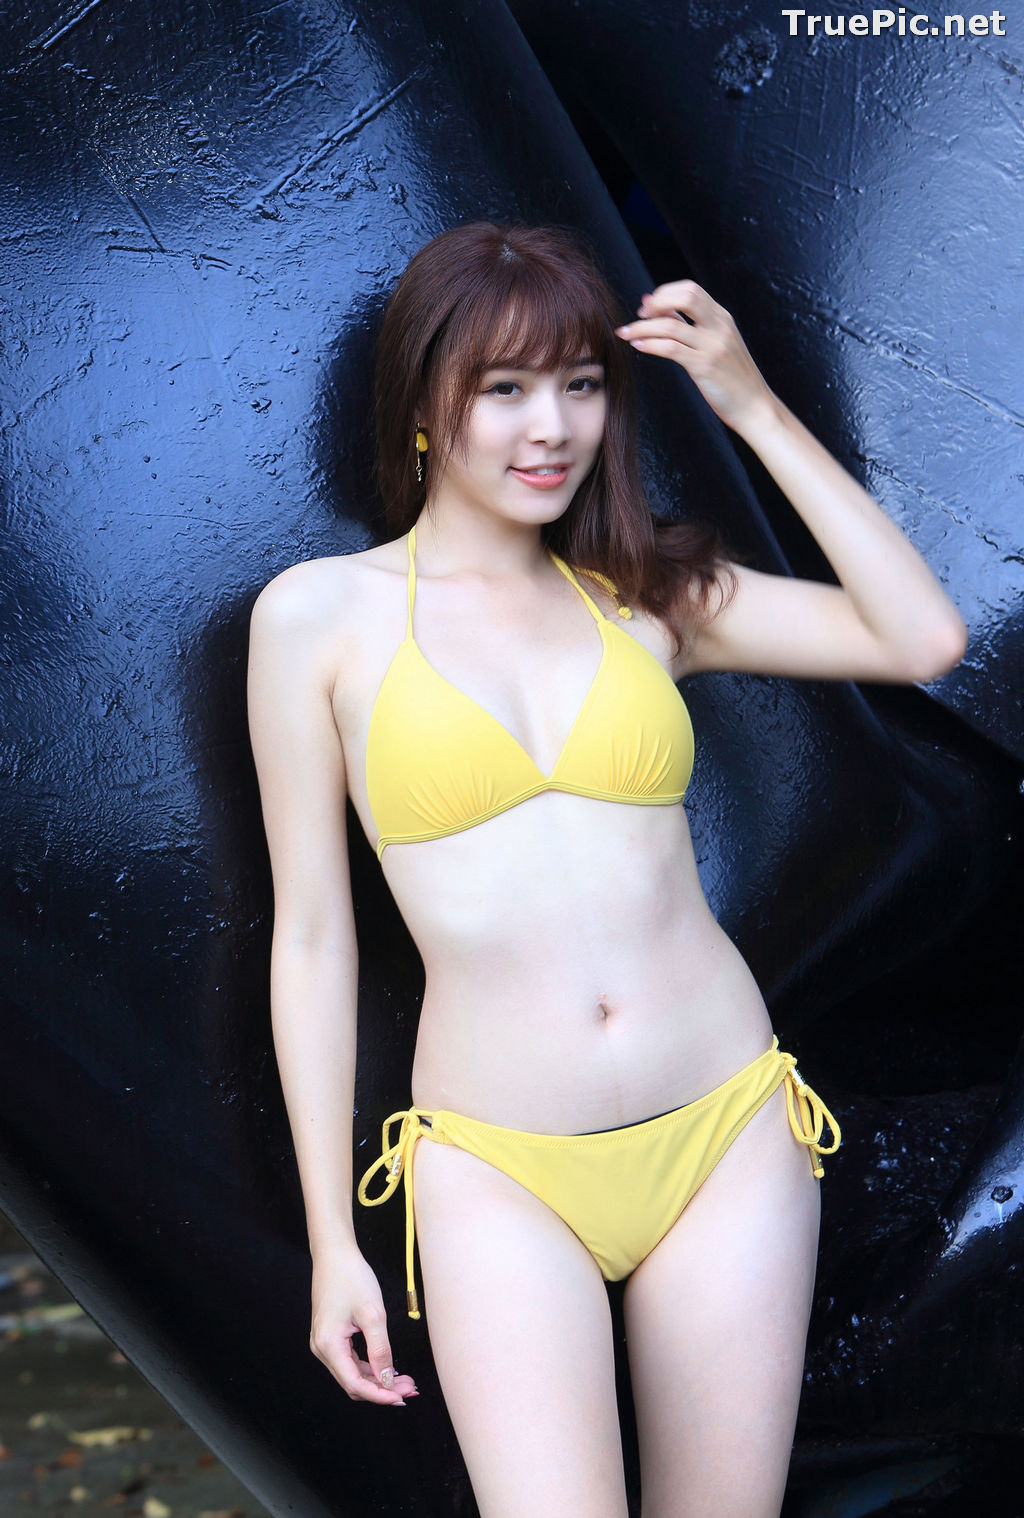 Image Taiwanese Model - Ash Ley - Yellow Bikini at Taipei Water Museum - TruePic.net - Picture-76